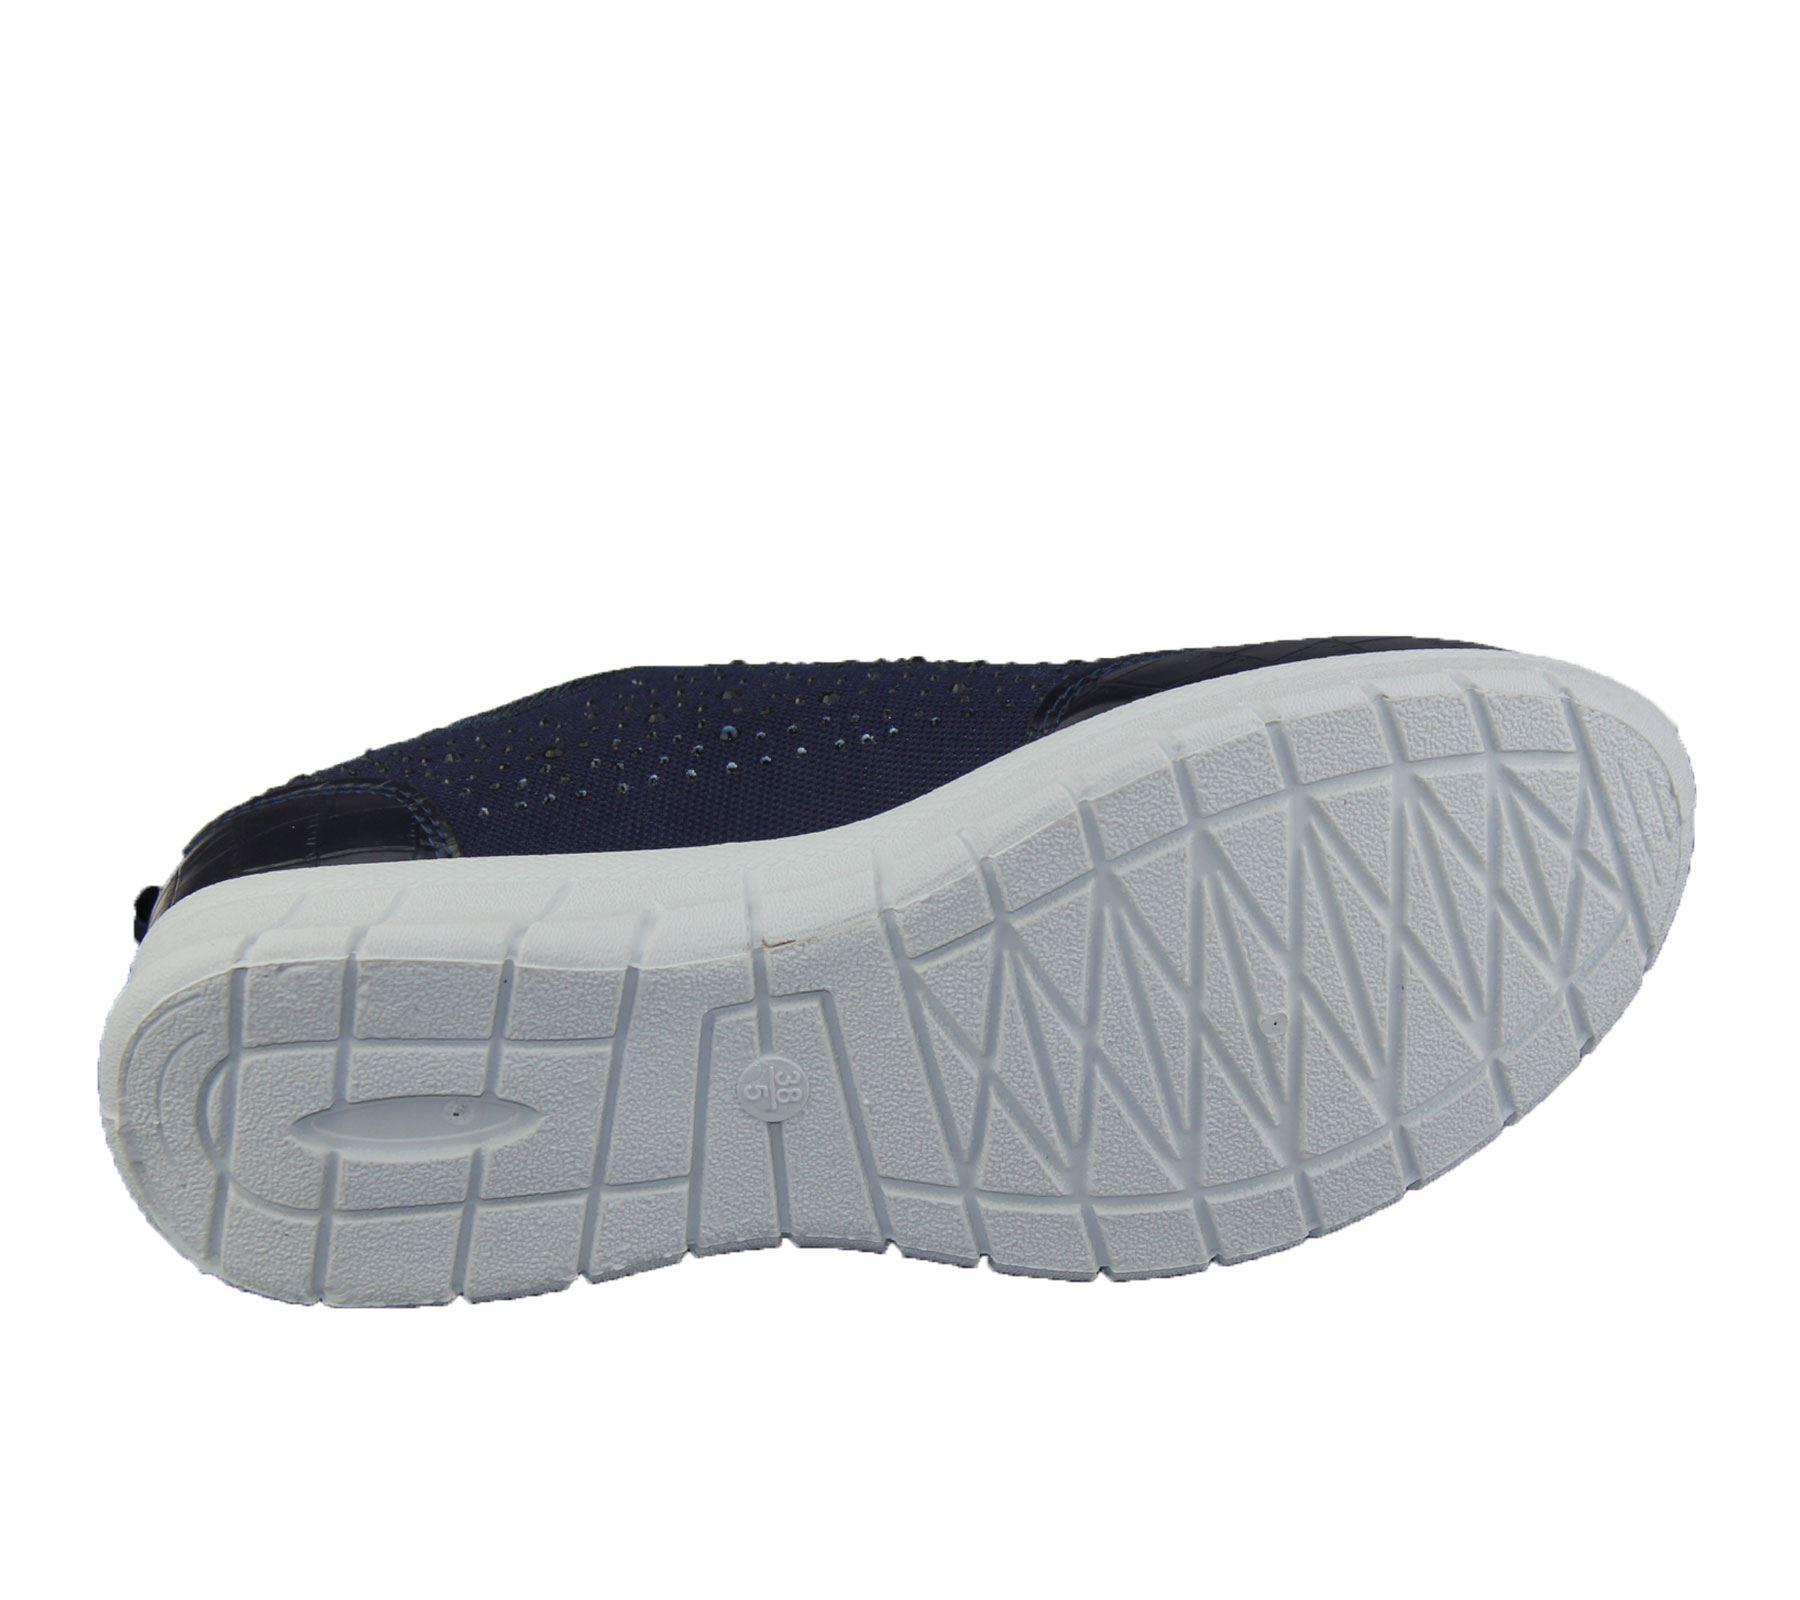 Womens-Trainer-Ladies-Comfort-Walking-Fashion-Summer-Gym-Sport-Flat-Shoes-Size thumbnail 15